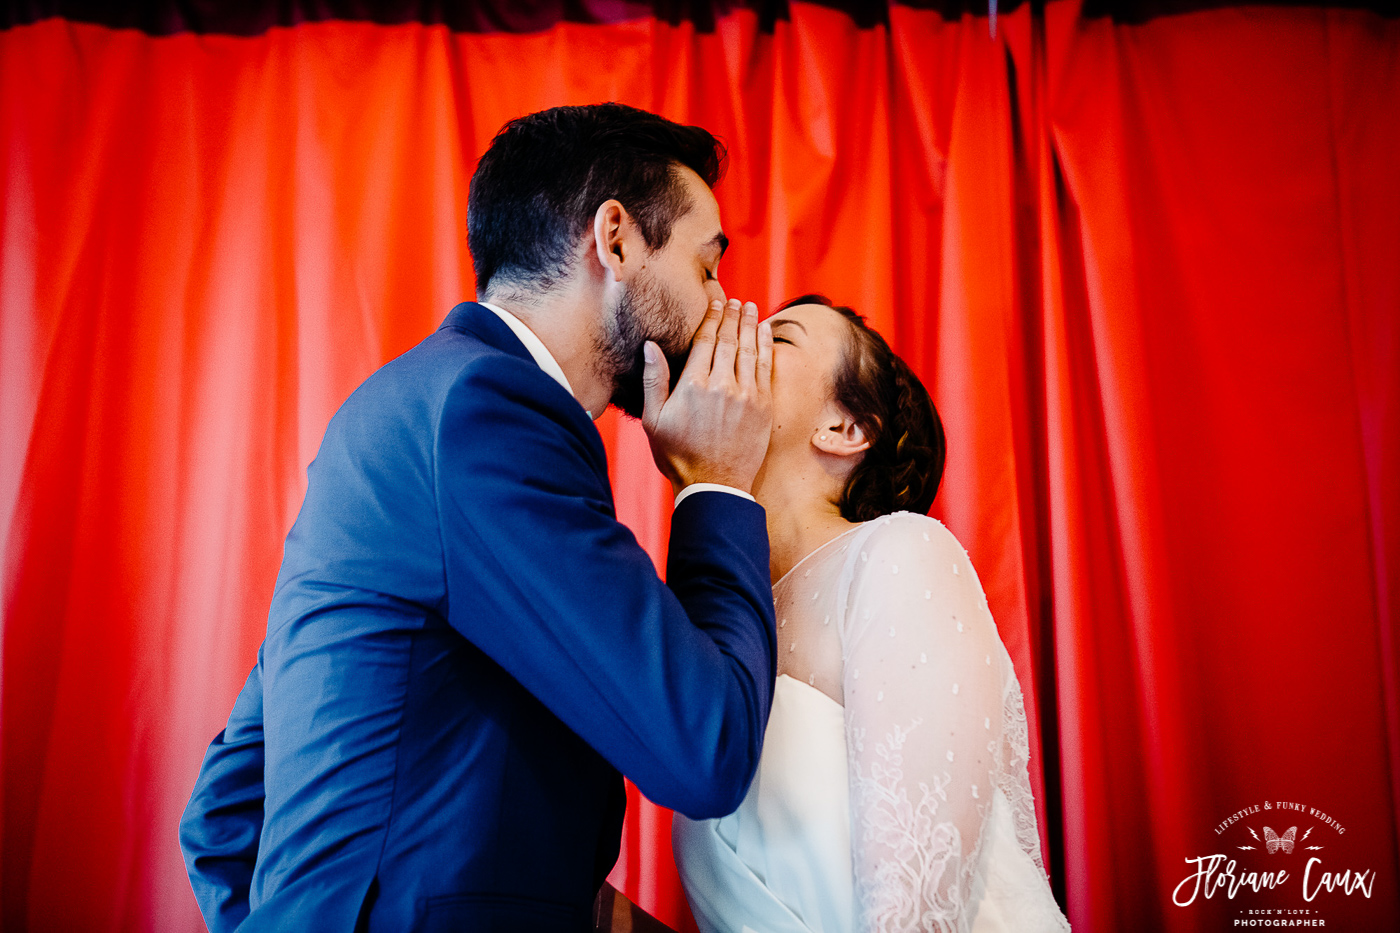 photographe-mariage-pays-basque-Floriane-Caux (20)